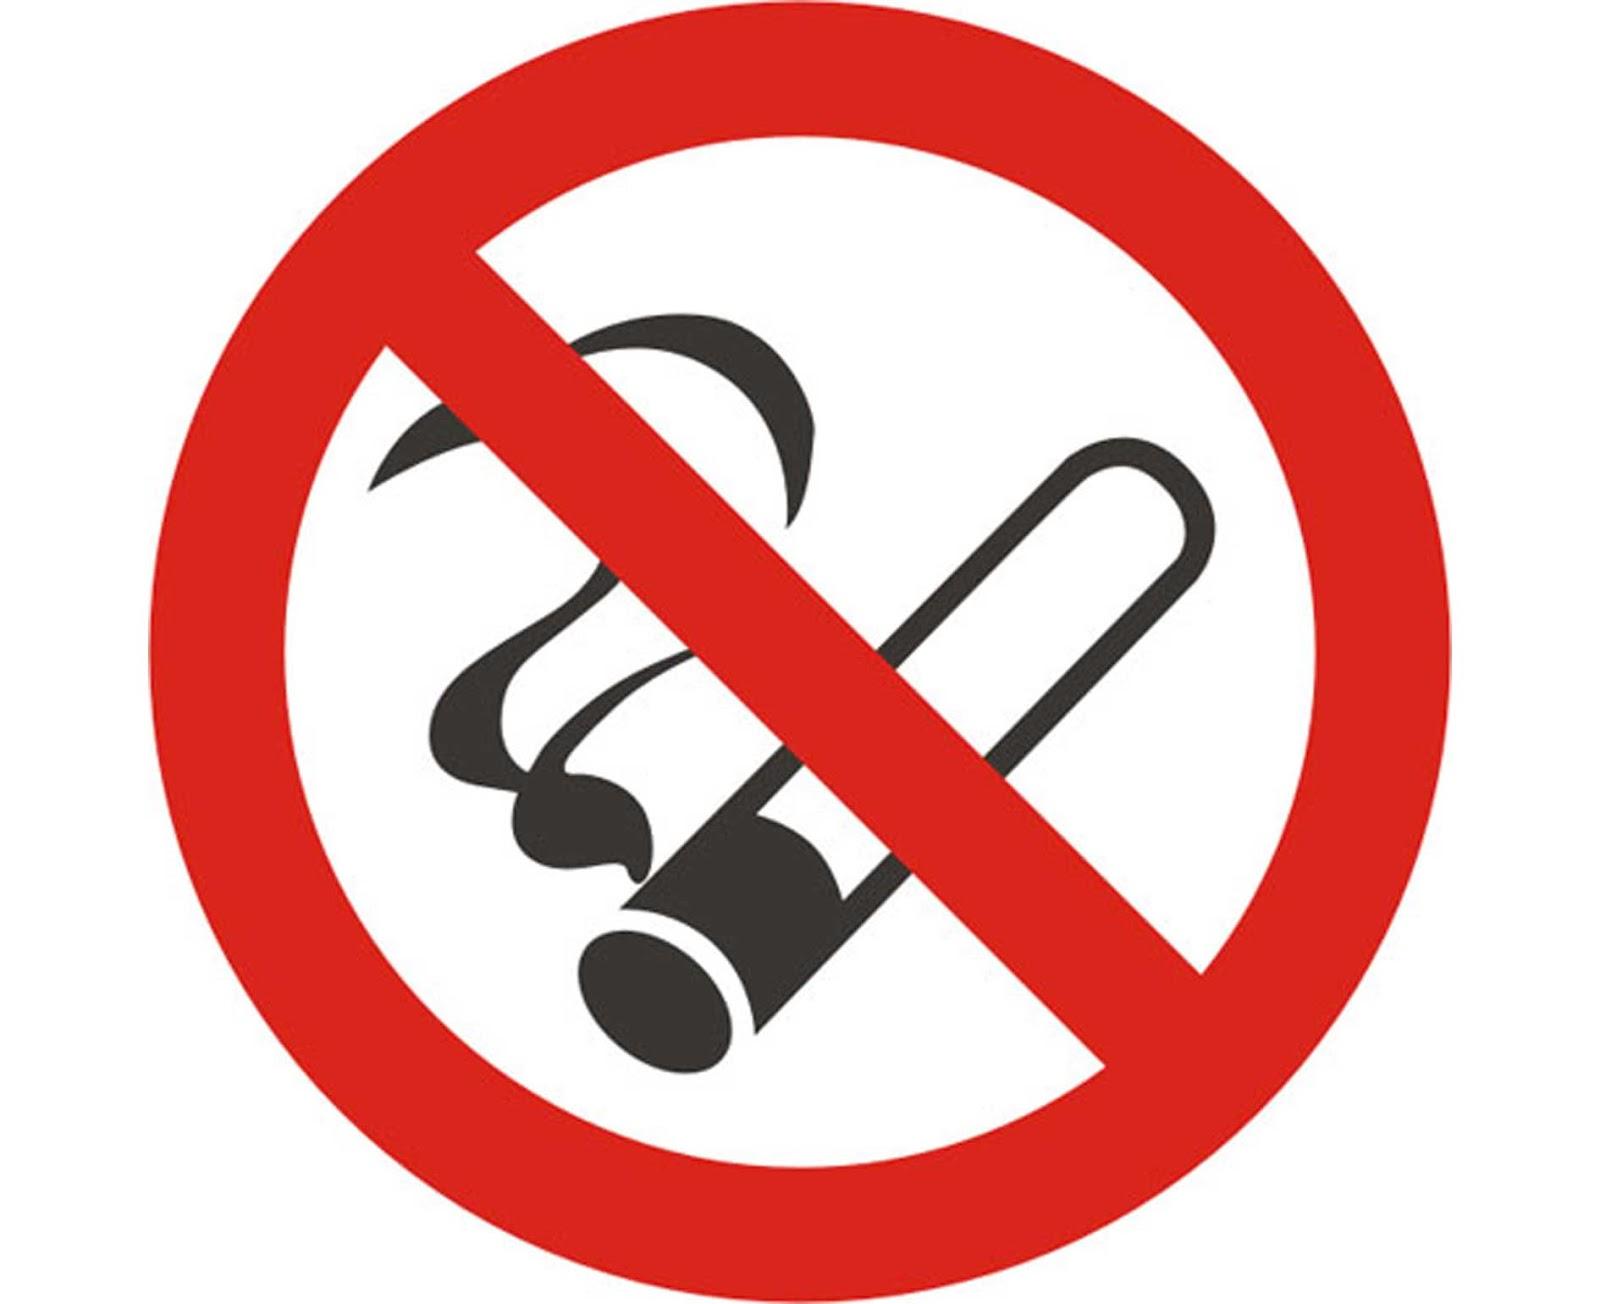 Mihardi77 Gambar Logo Simbol No Smoking Keren Abiis